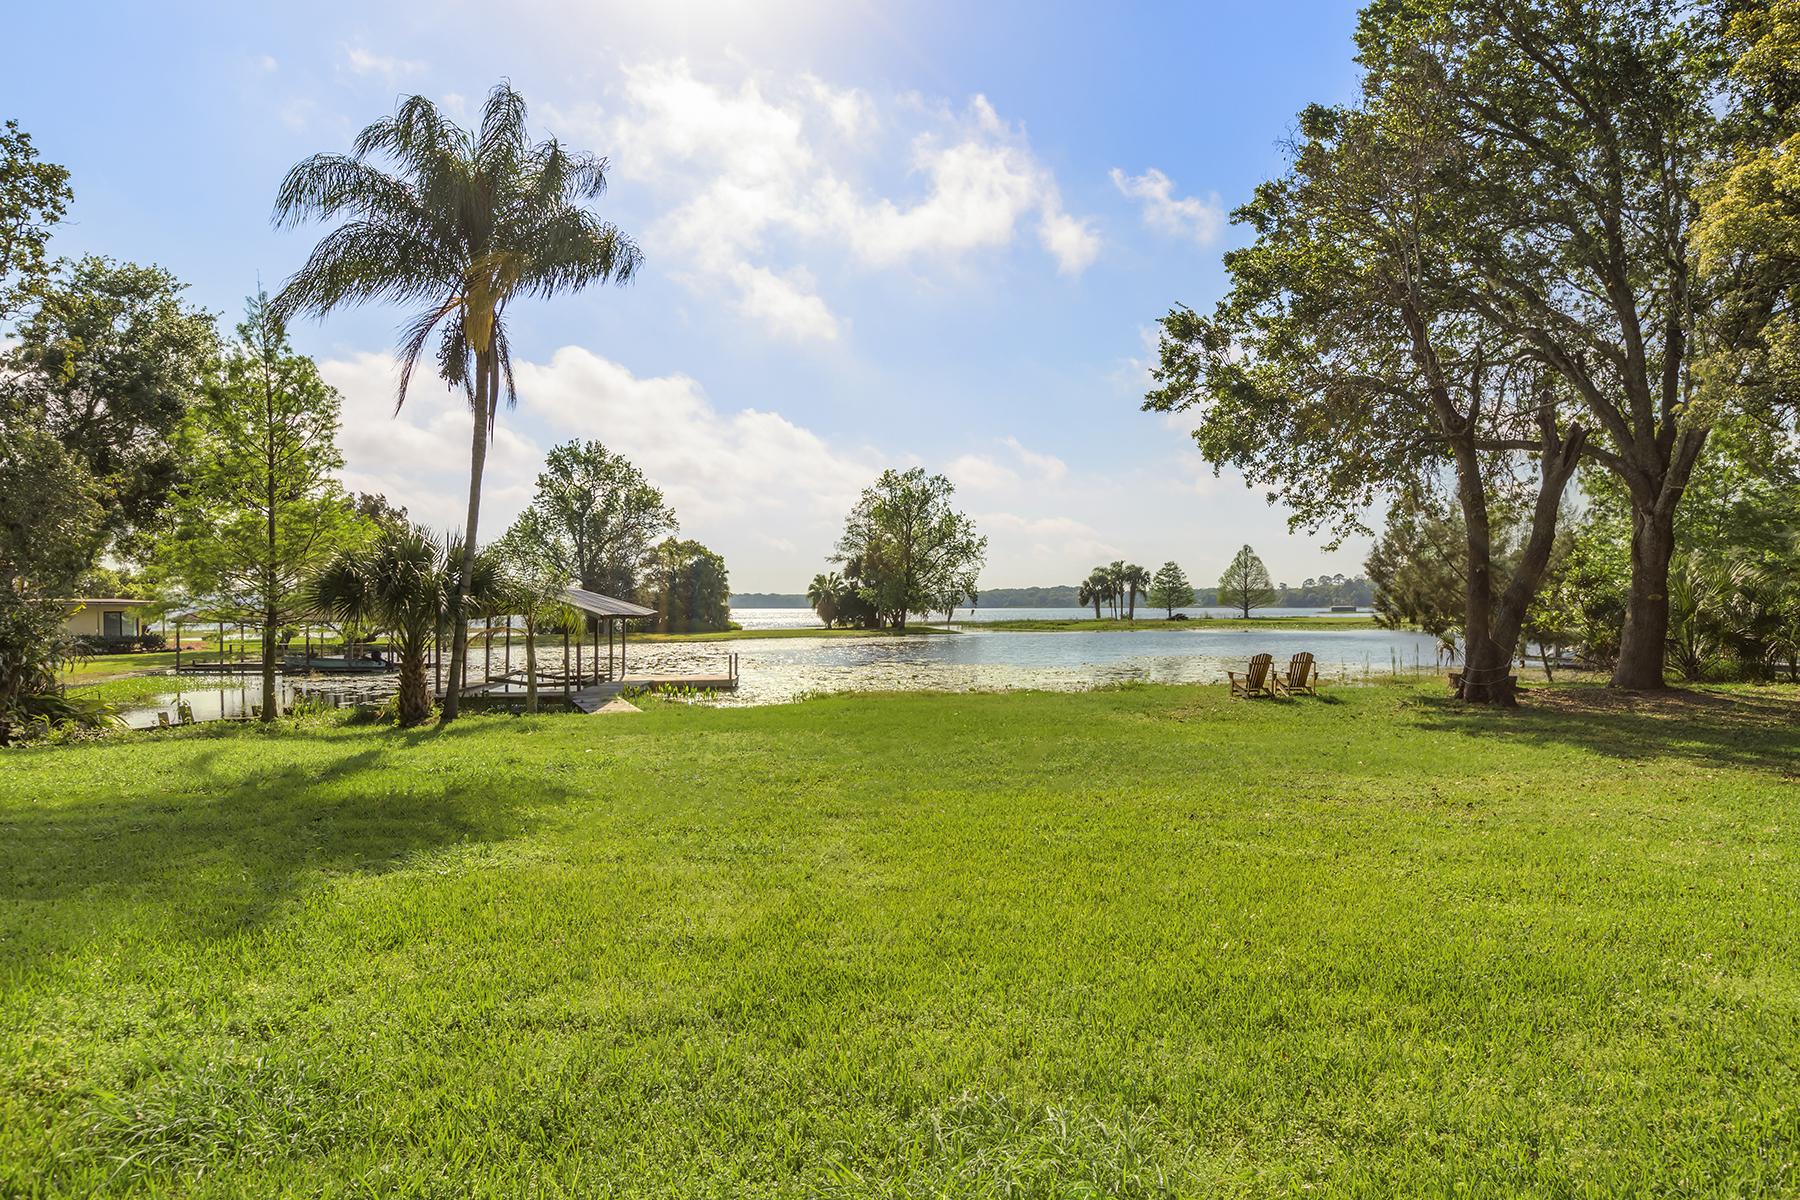 Single Family Home for Sale at ORLANDO - MOUNT DORA 4931 Dora Dr Mount Dora, Florida, 32757 United States